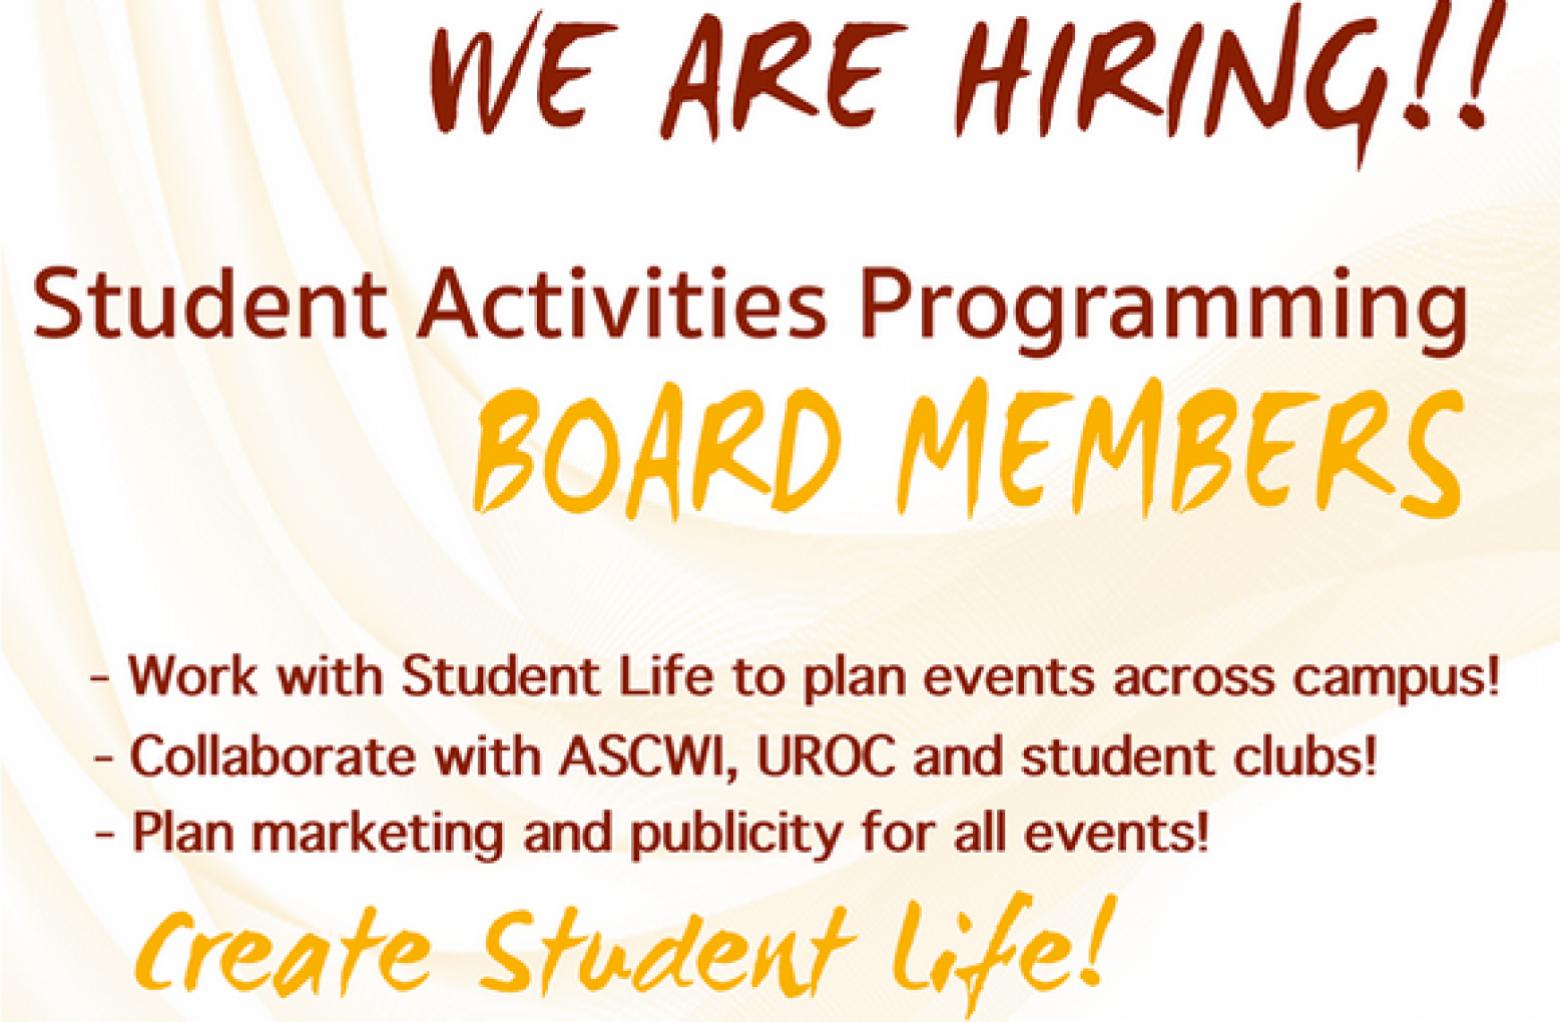 We Are Hiring - Student Activities Programming Board Members